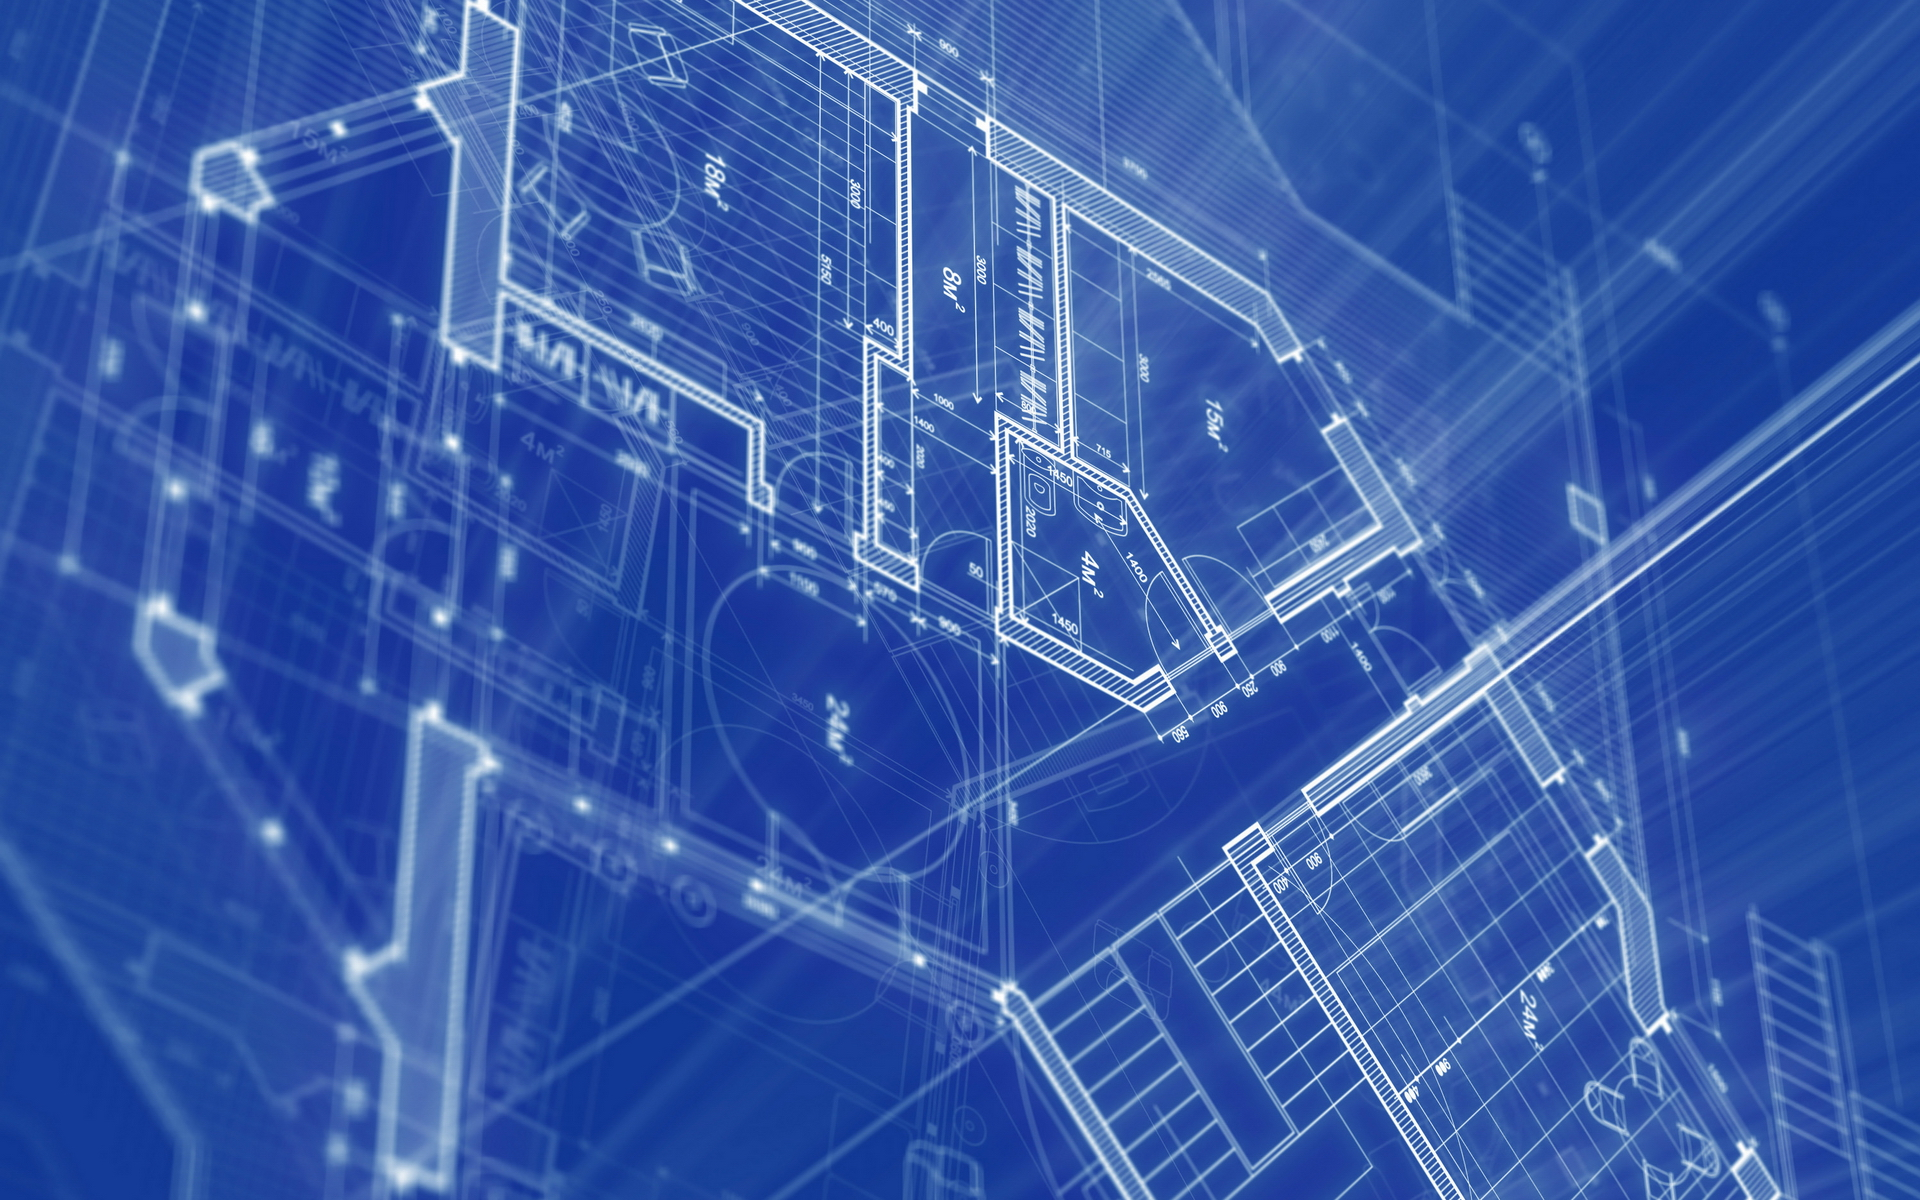 Belle associates llc blueprintsg malvernweather Image collections